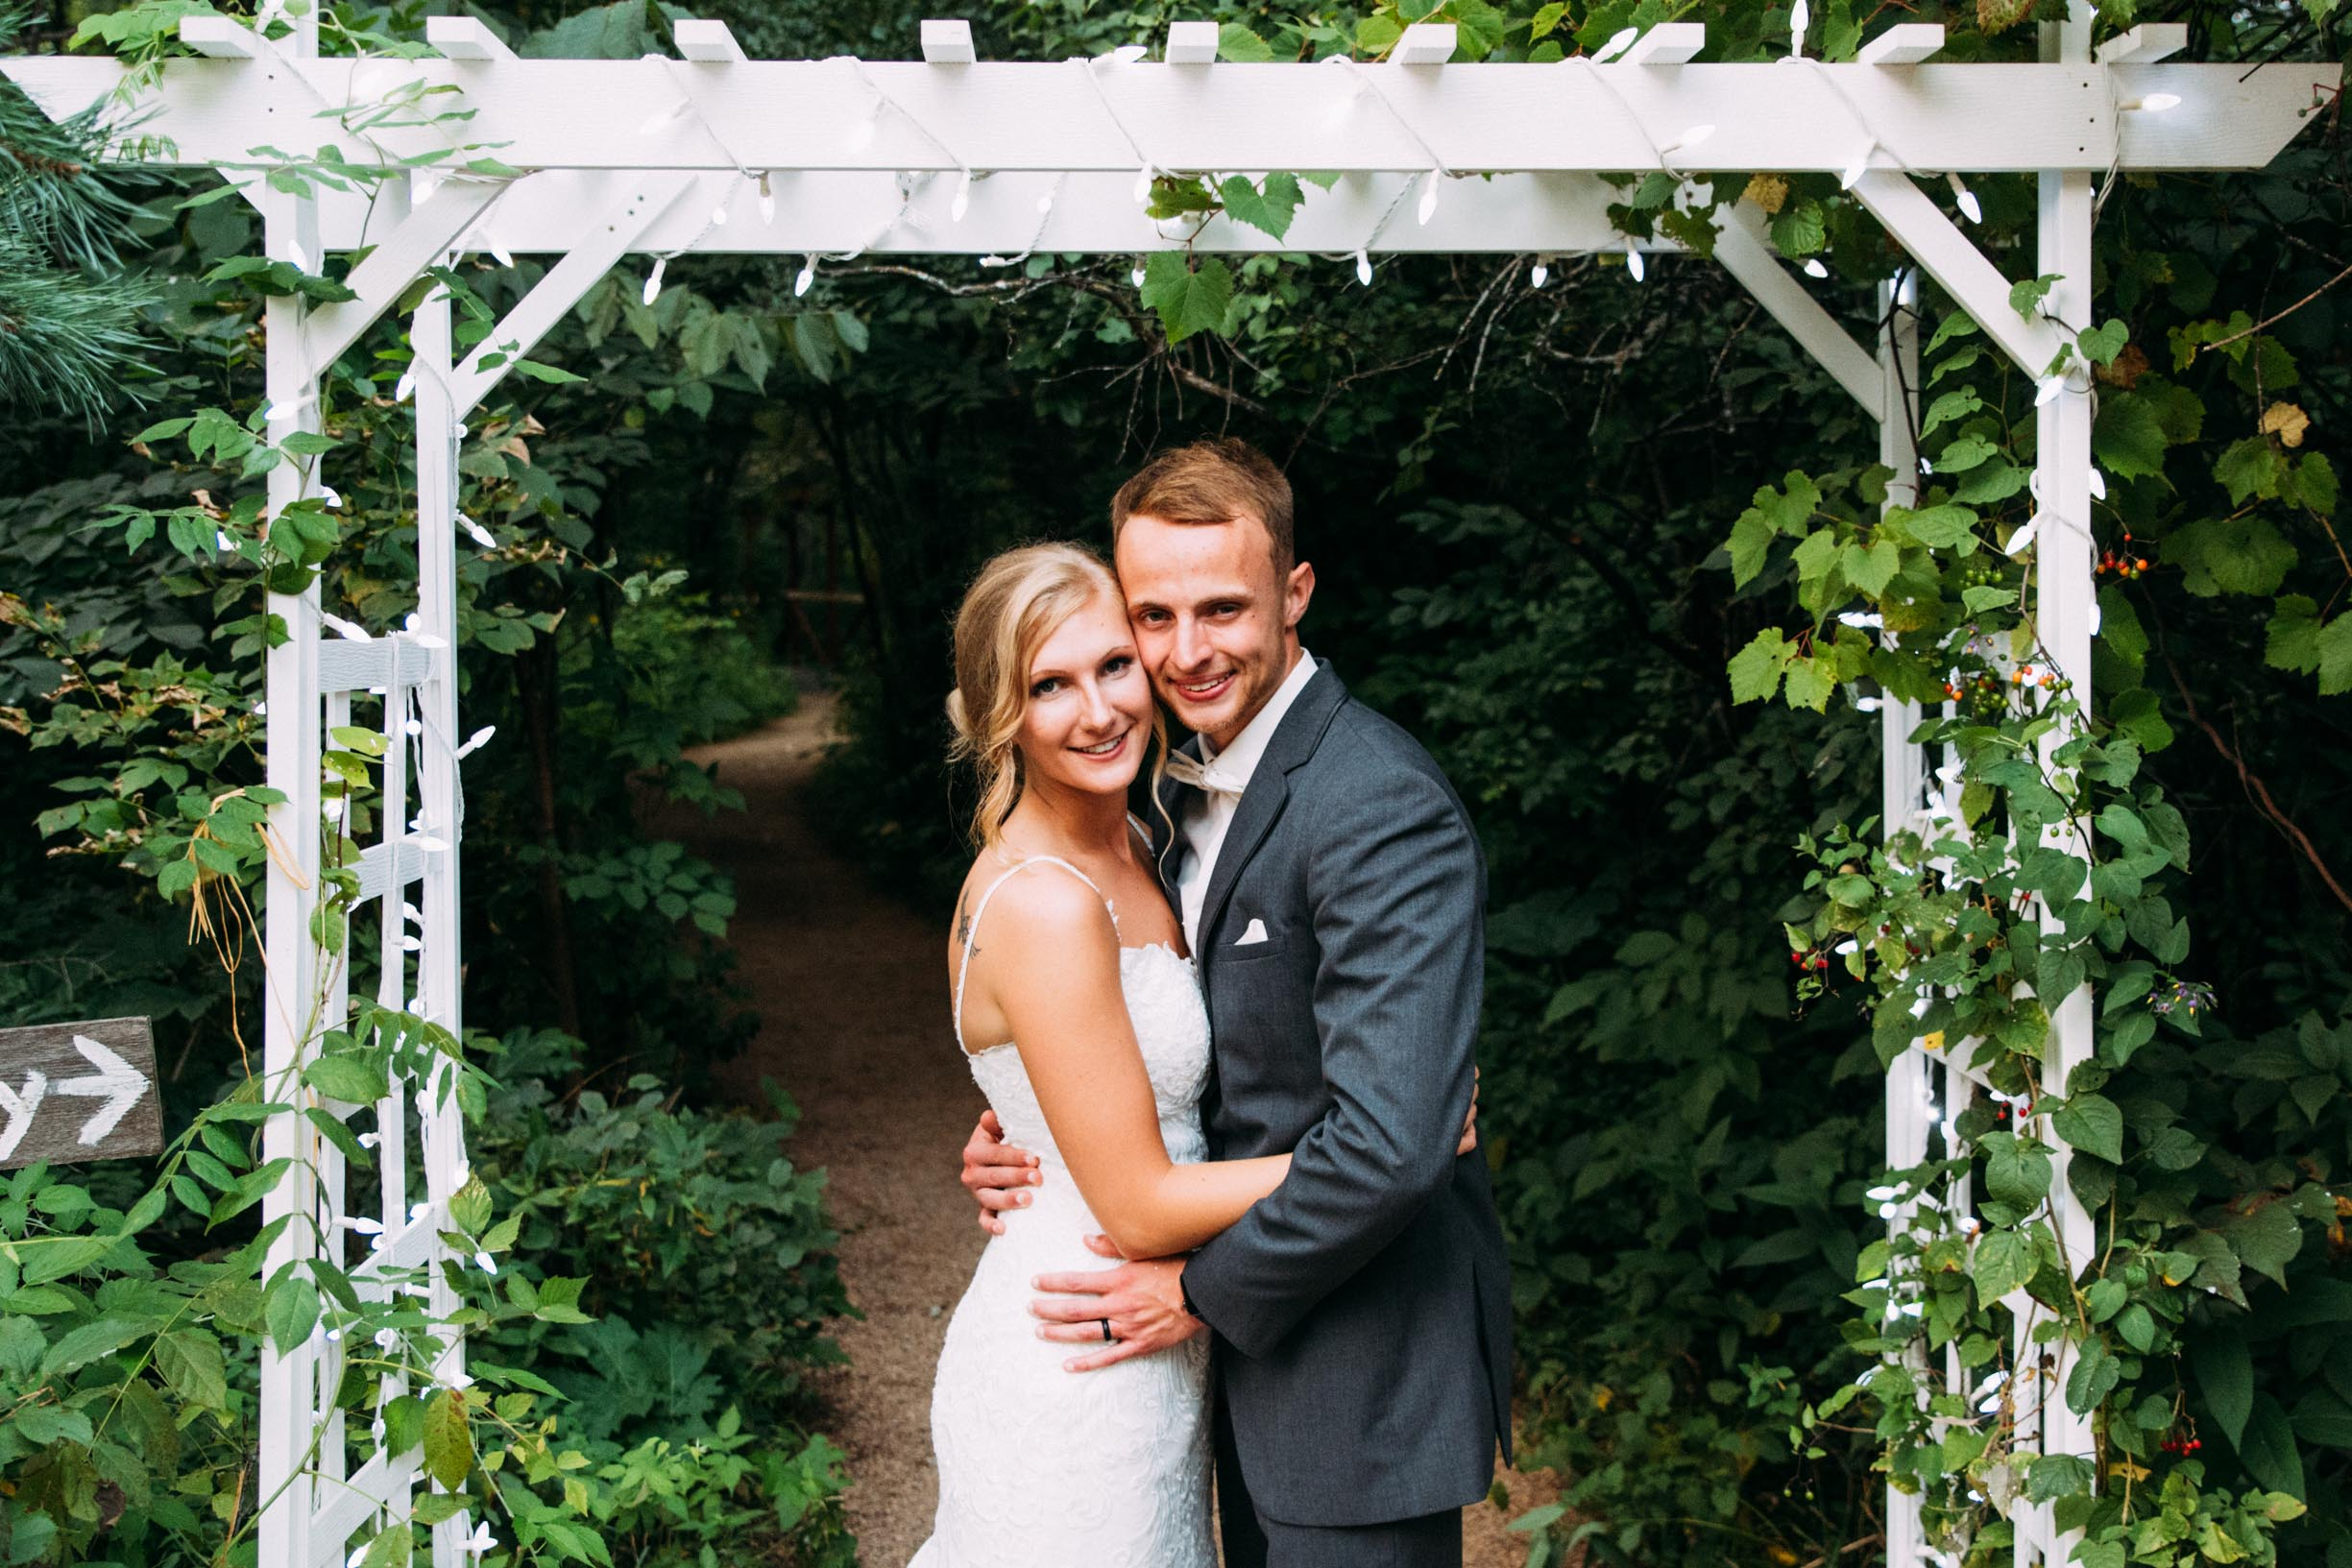 37-Minnetonka Orchards Wedding Ashley Bryce Blog.jpg